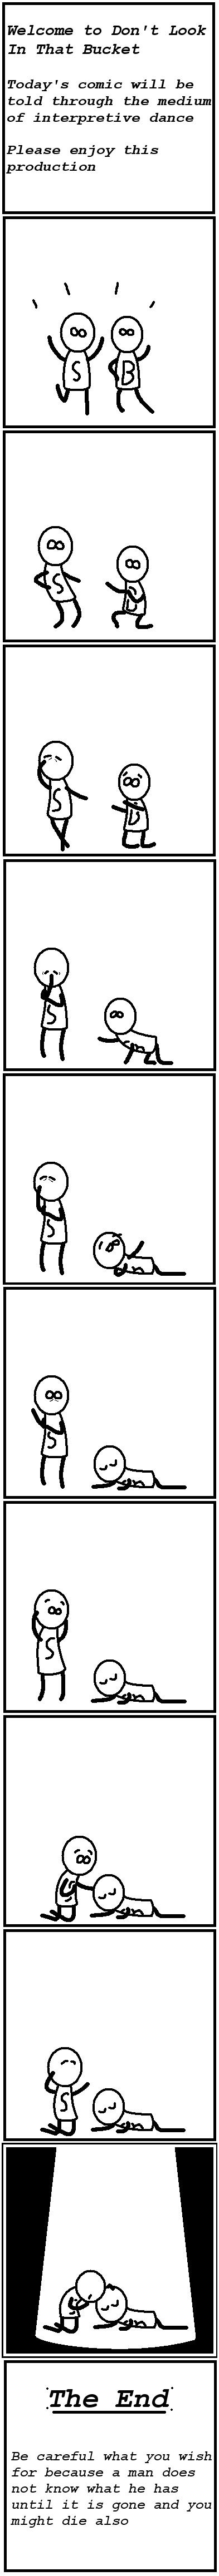 Interpretive comic